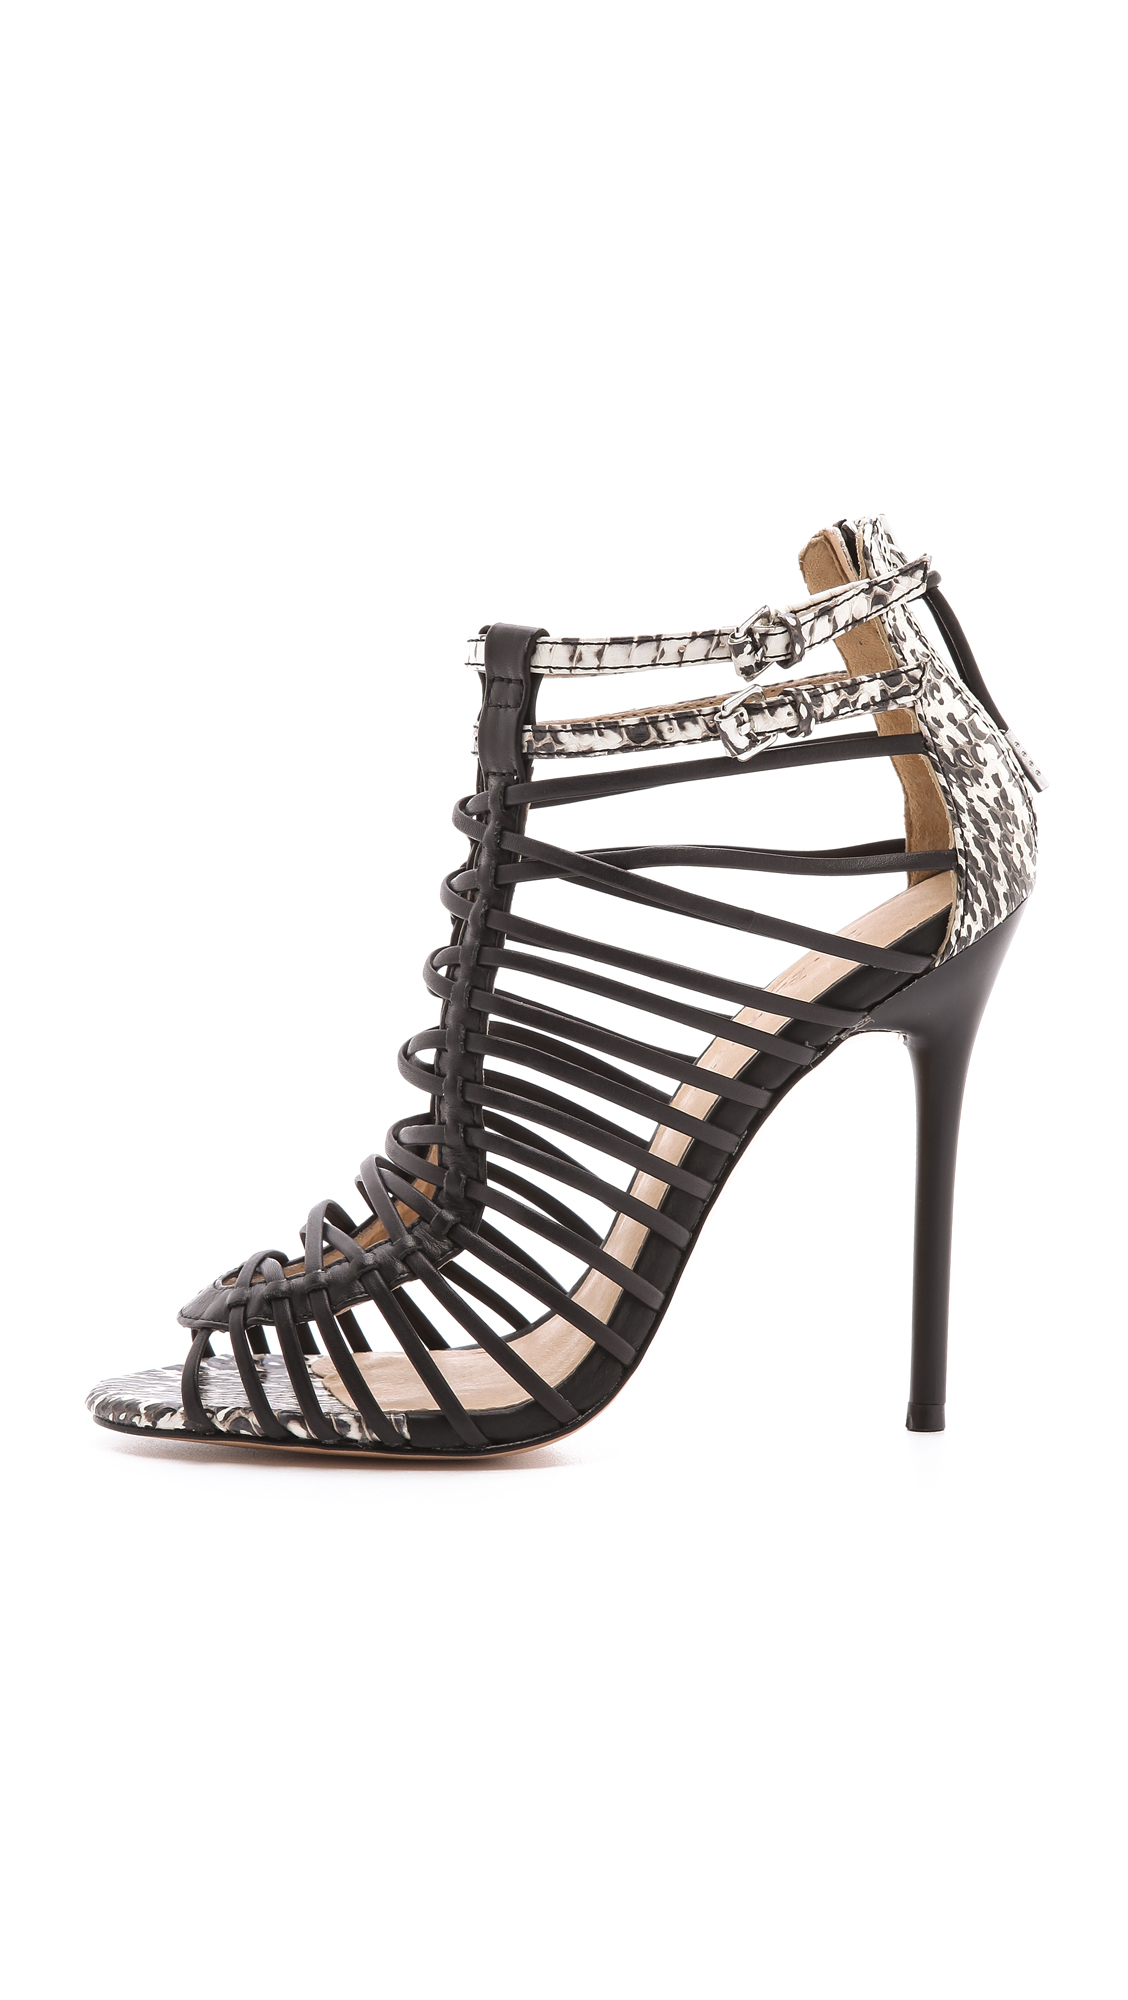 L.a.m.b. Payton Strappy High Heel Sandals in Black   Lyst